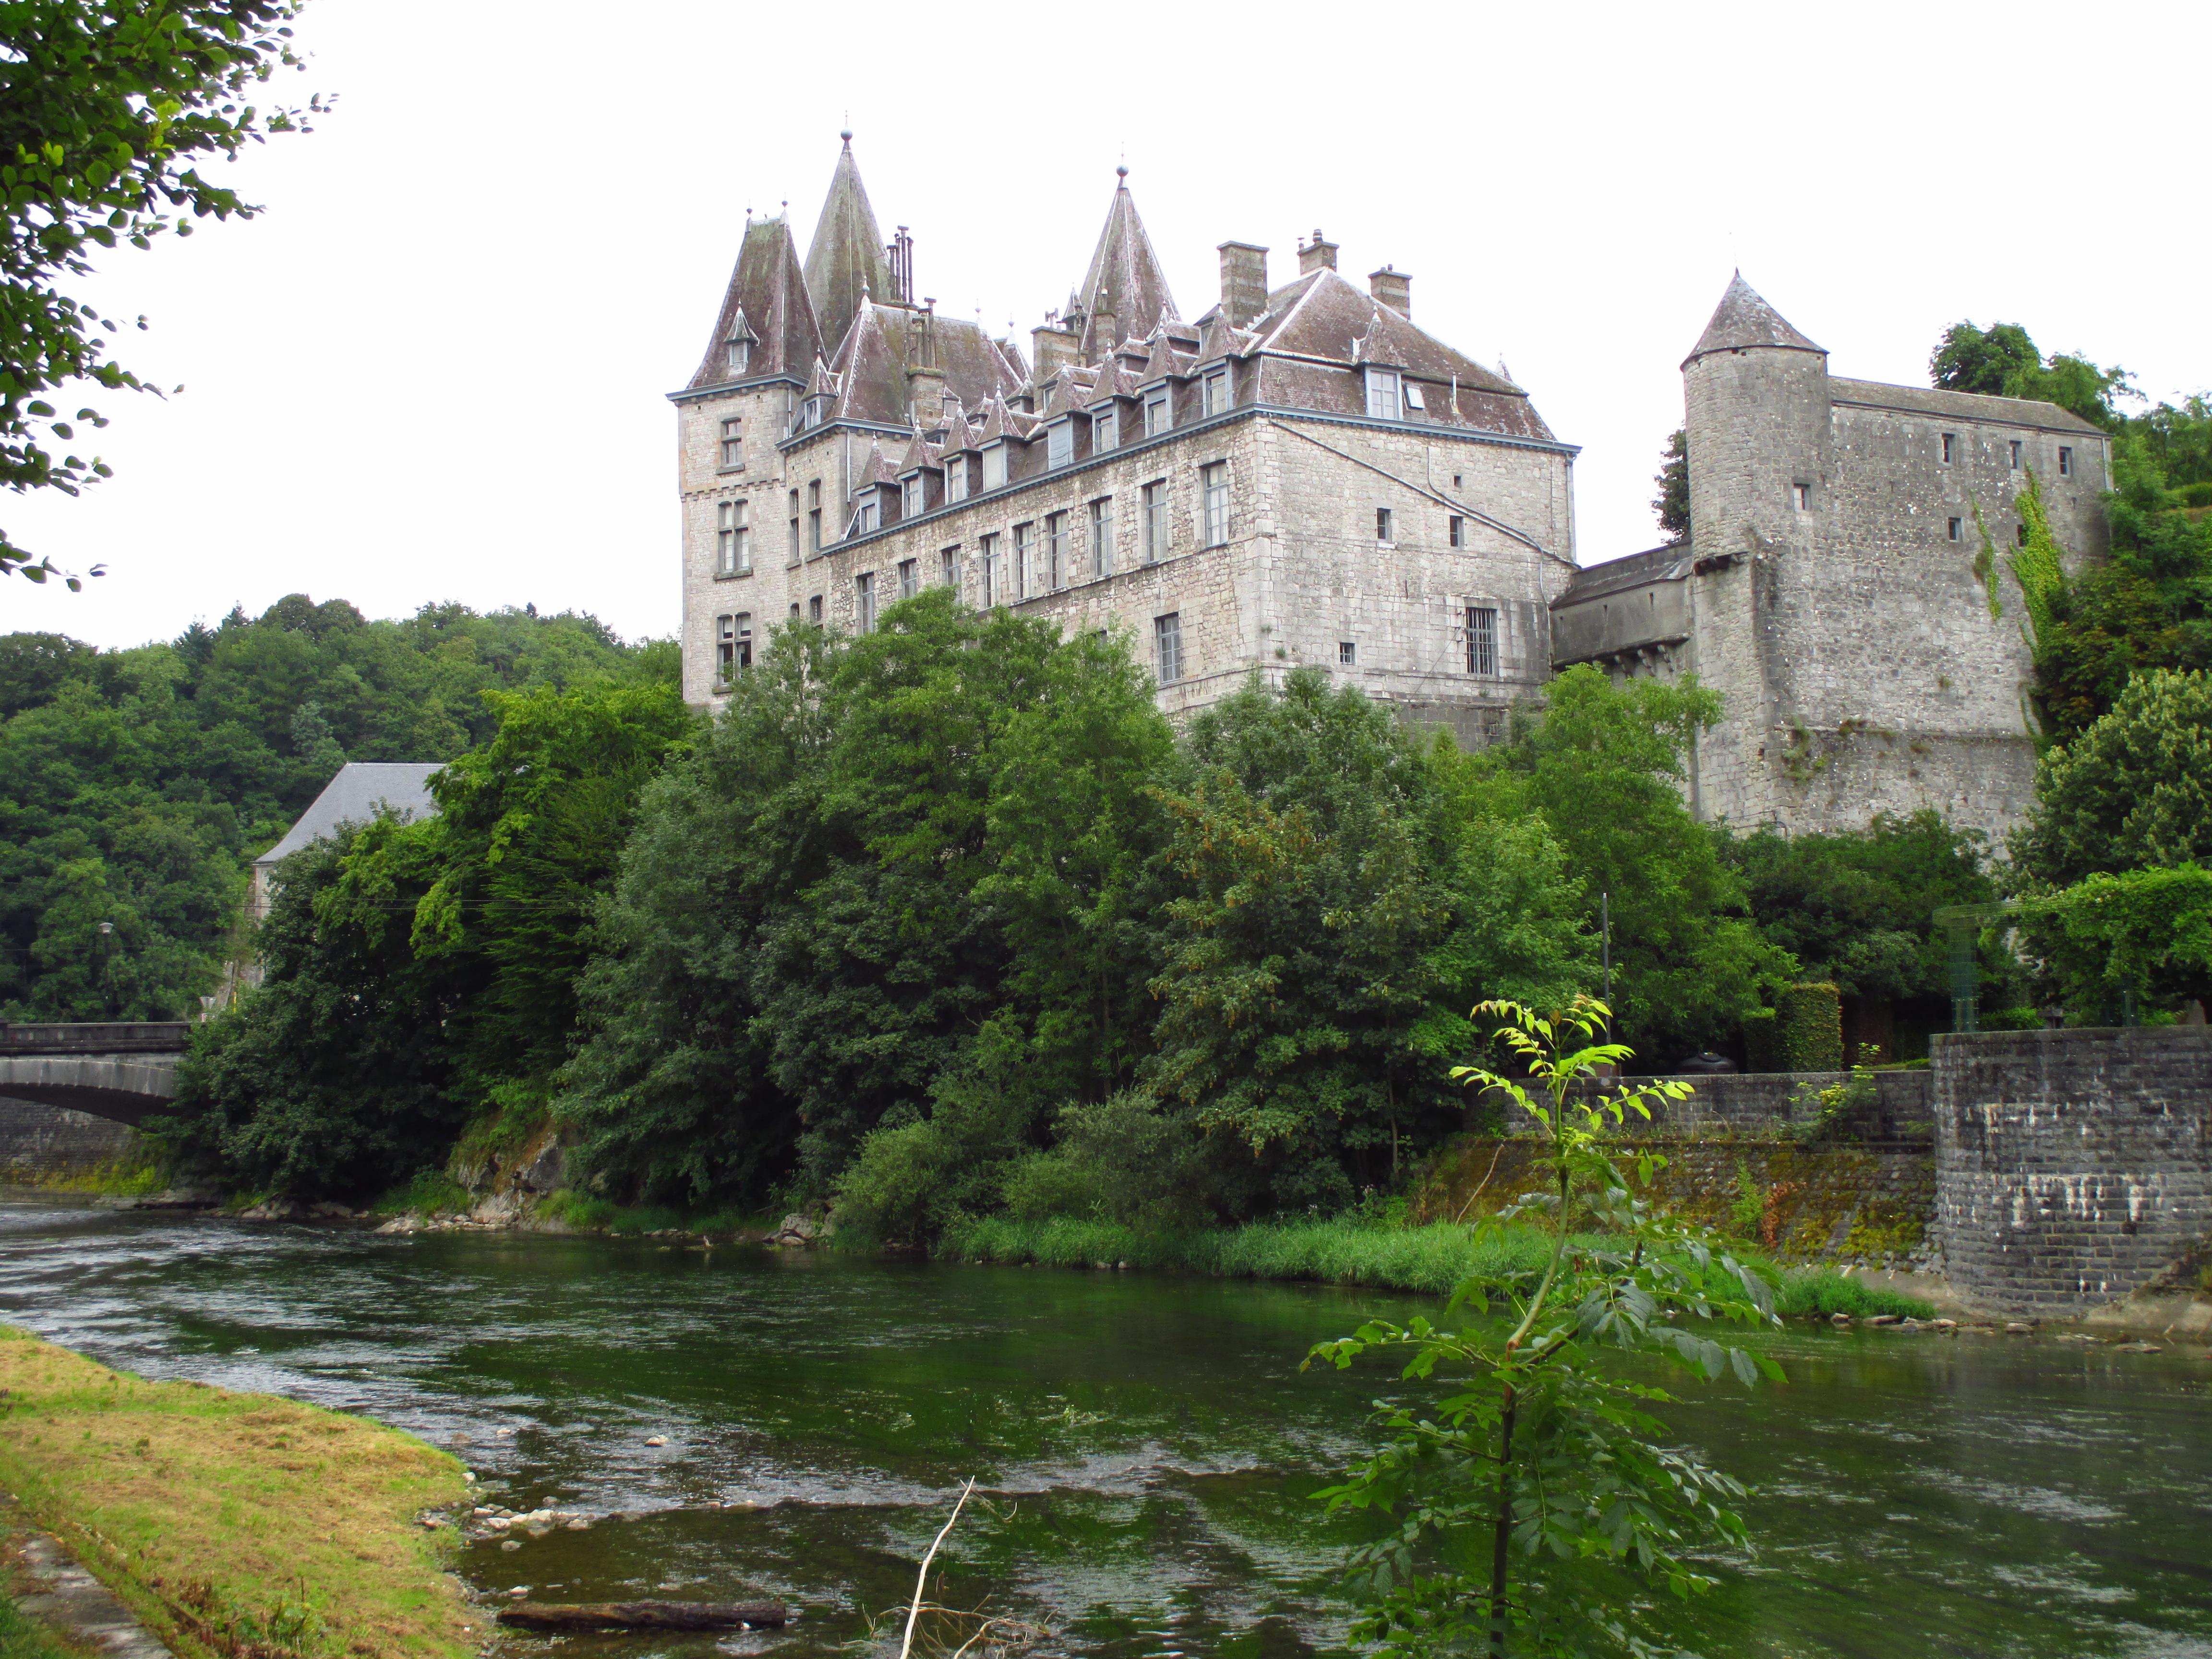 File:Durbuy castle.JPG - Wikimedia Commons: commons.wikimedia.org/wiki/File:Durbuy_castle.JPG